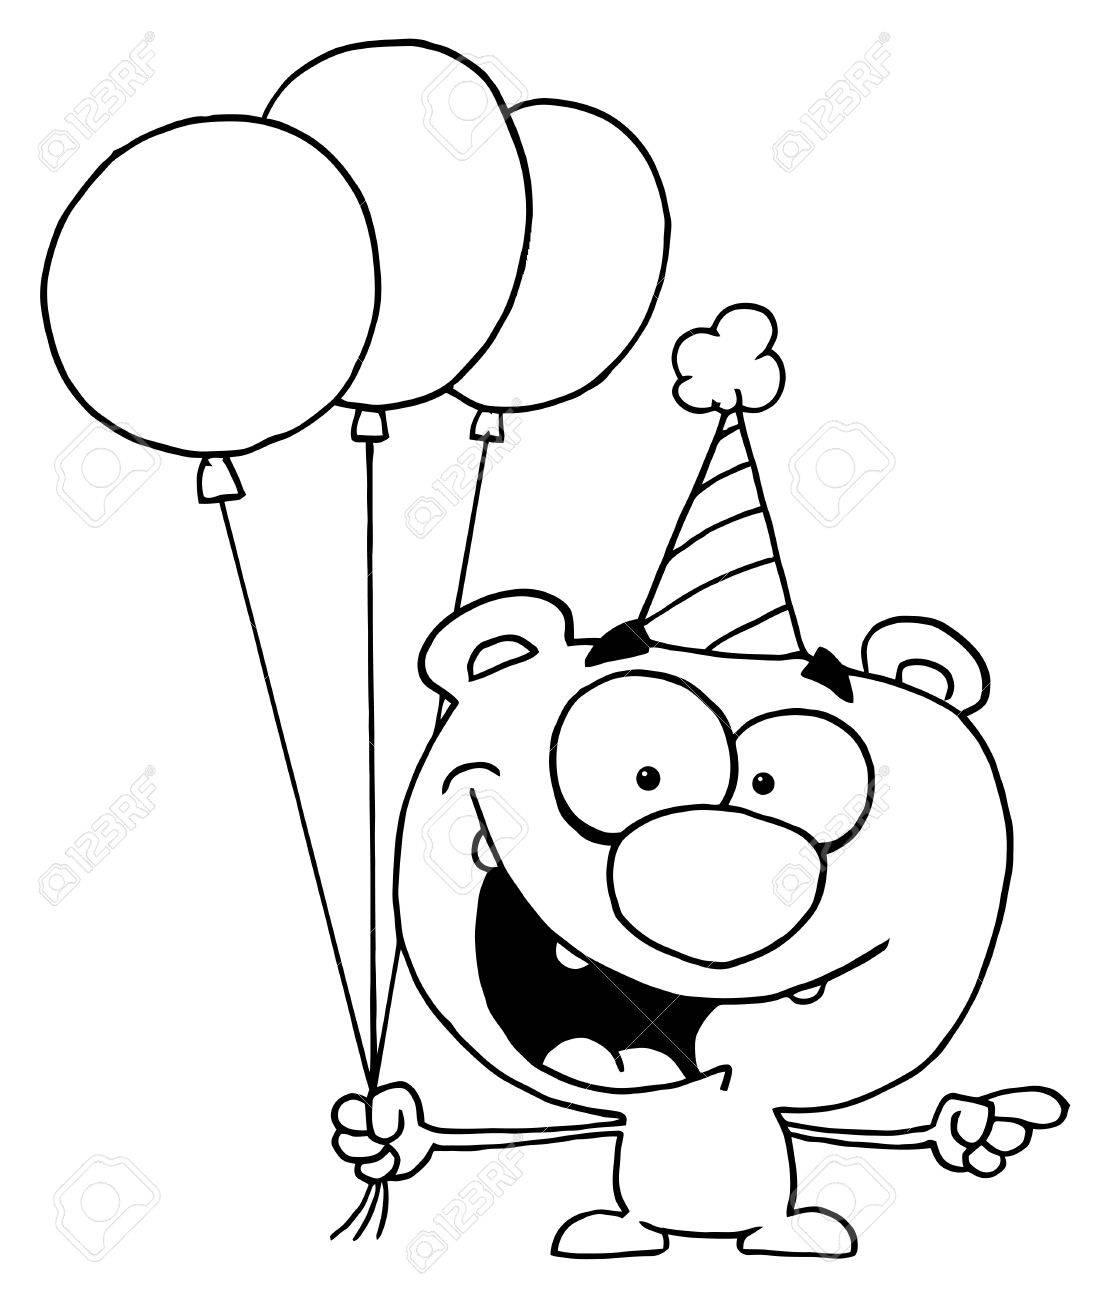 Outlined Birthday Bear Stock Vector - 16597272